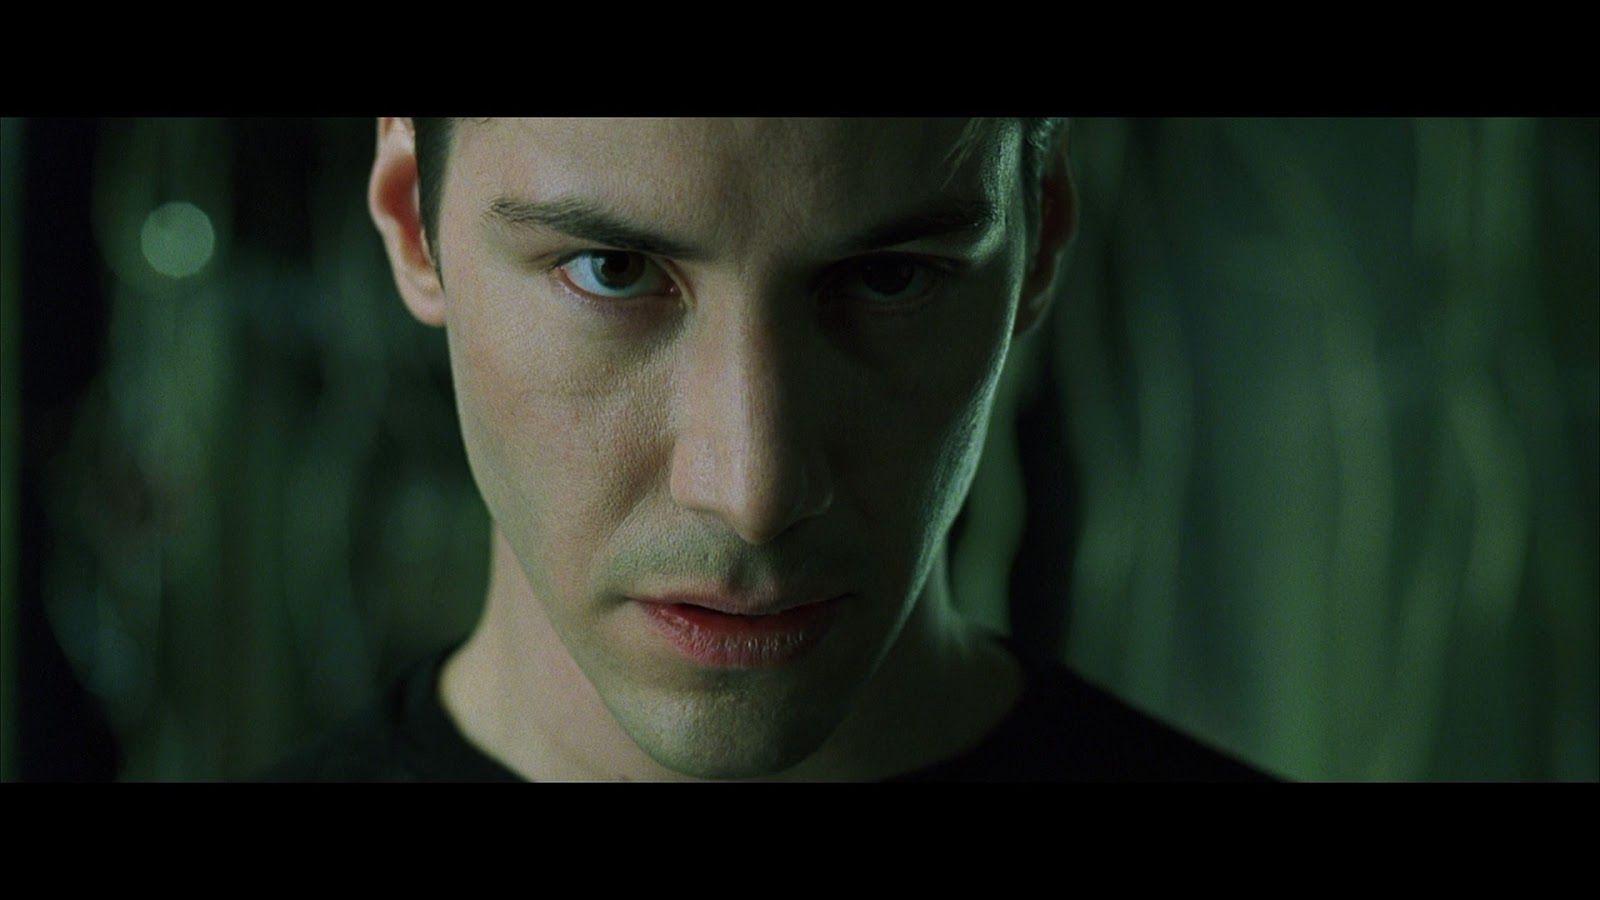 the matrix neo wallpaper | Фильмы, Киану ривз и Матрица